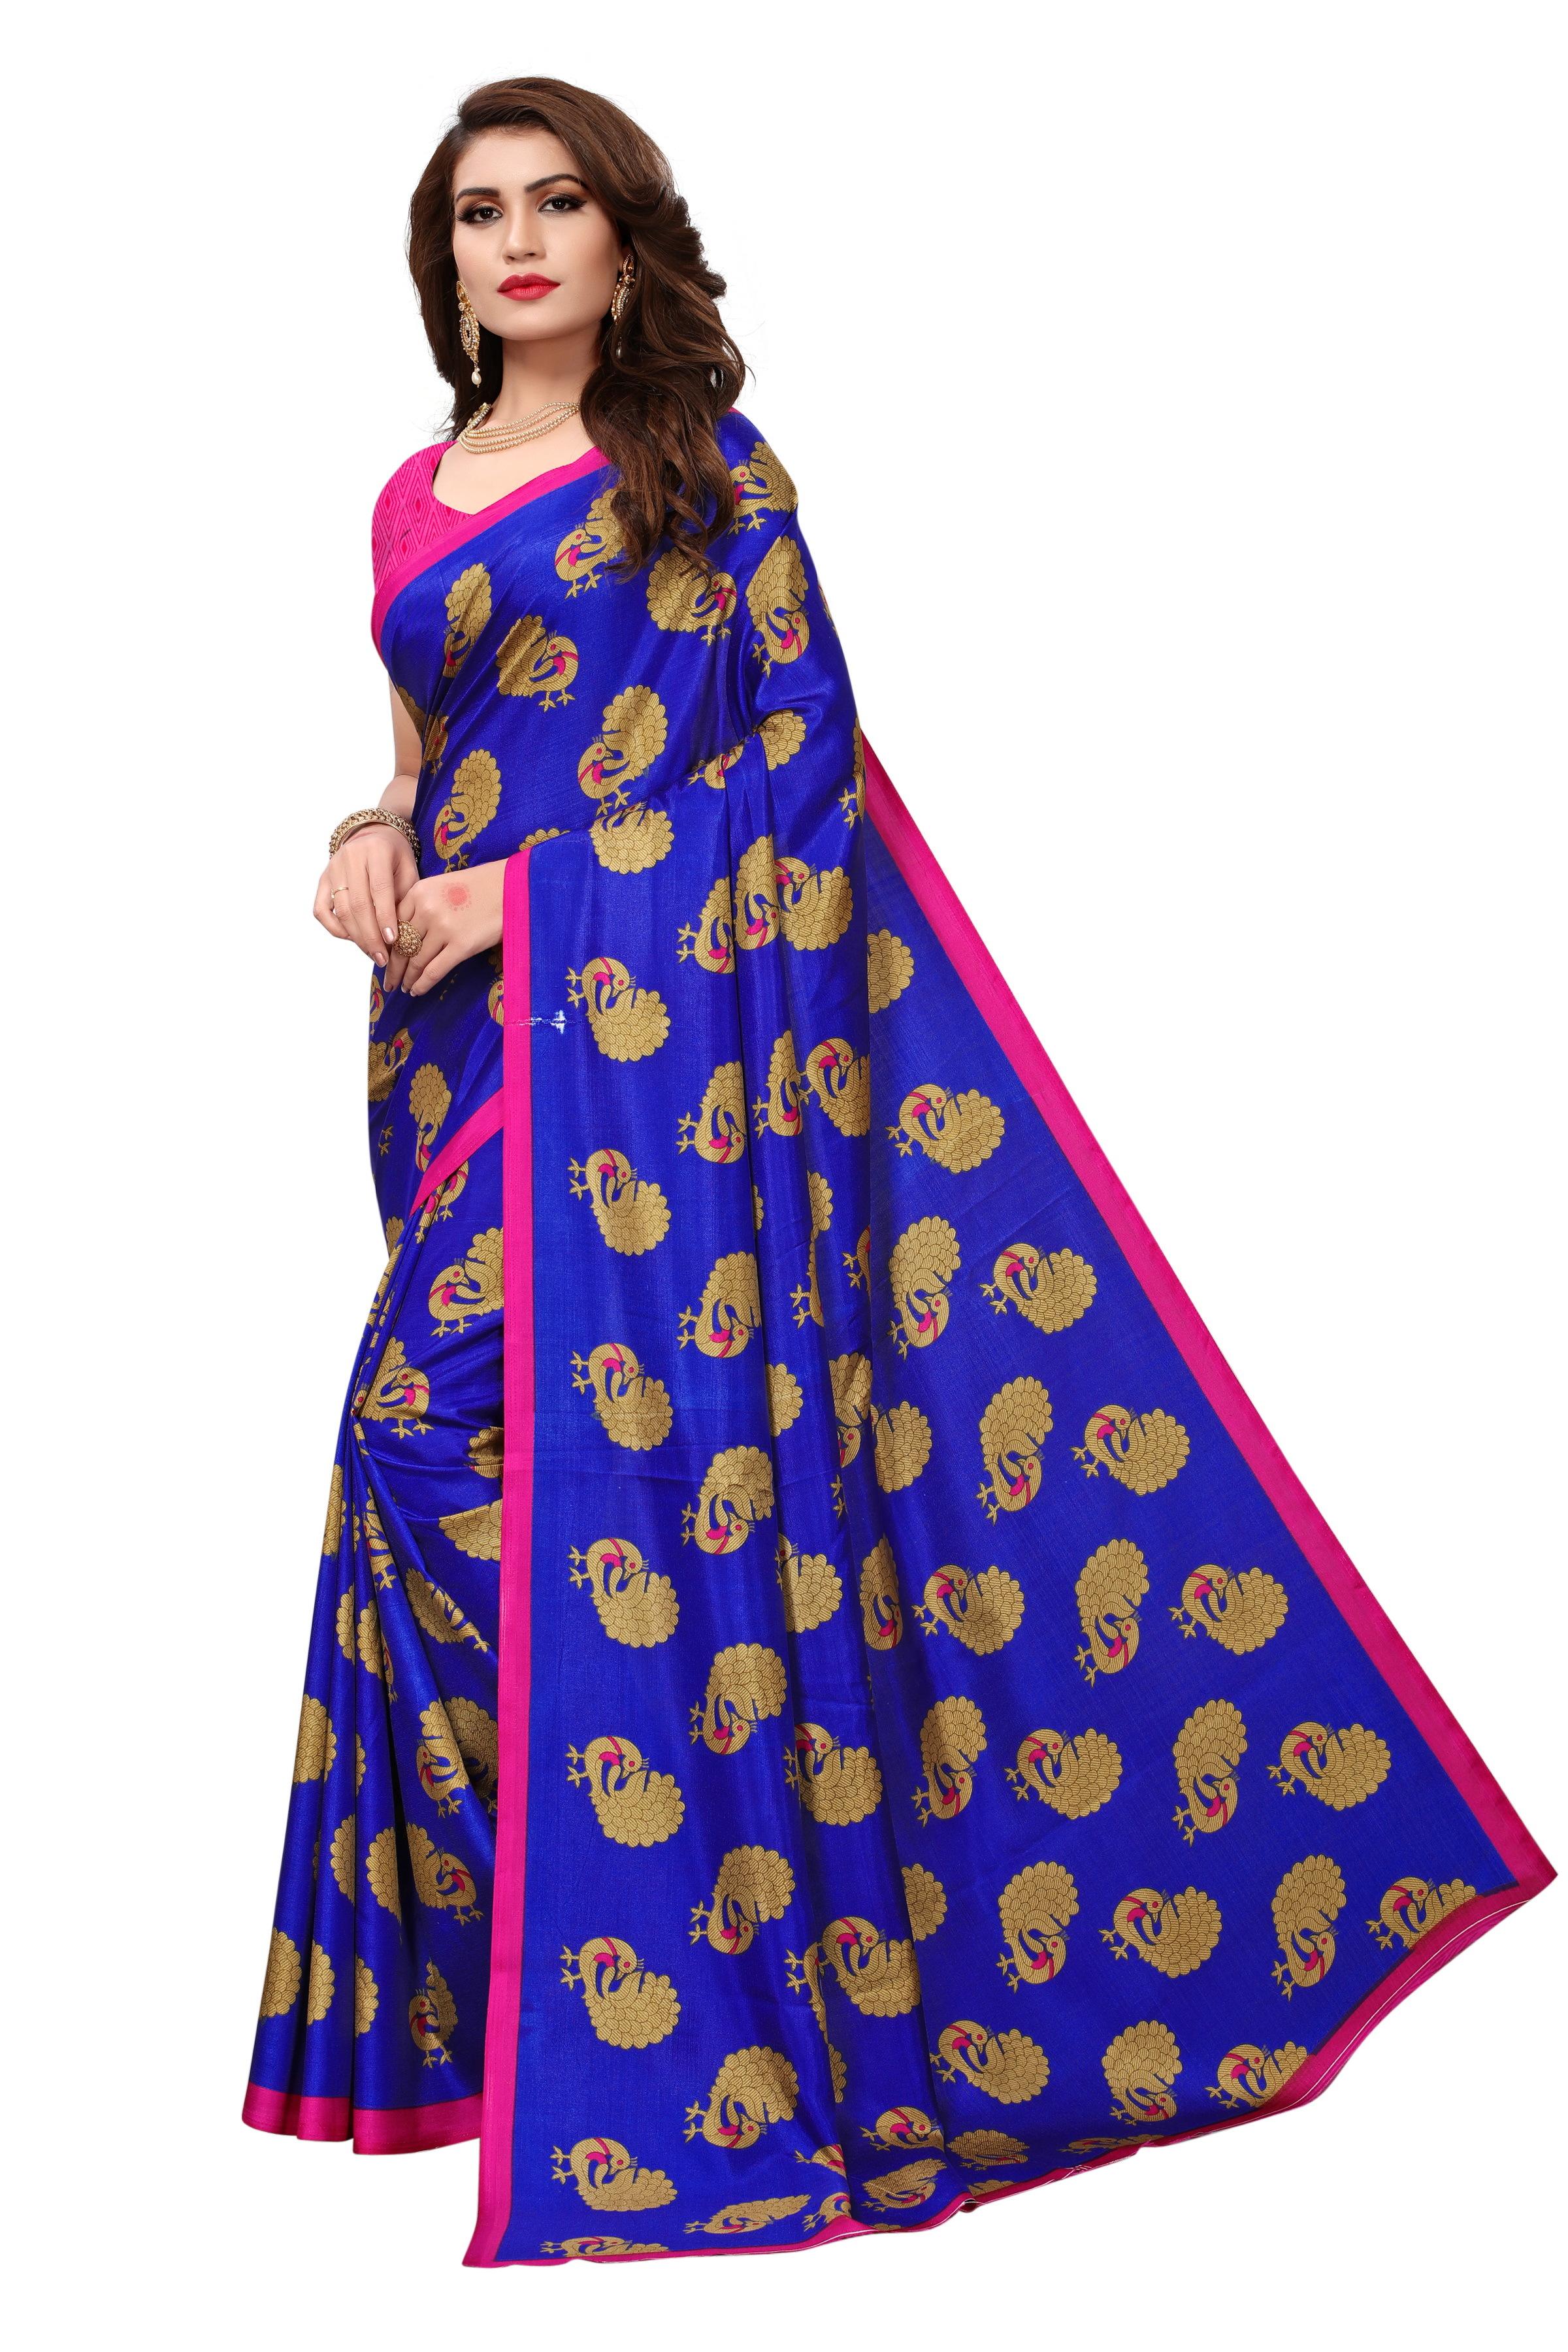 New Maalgudi Gopala Blue Saree